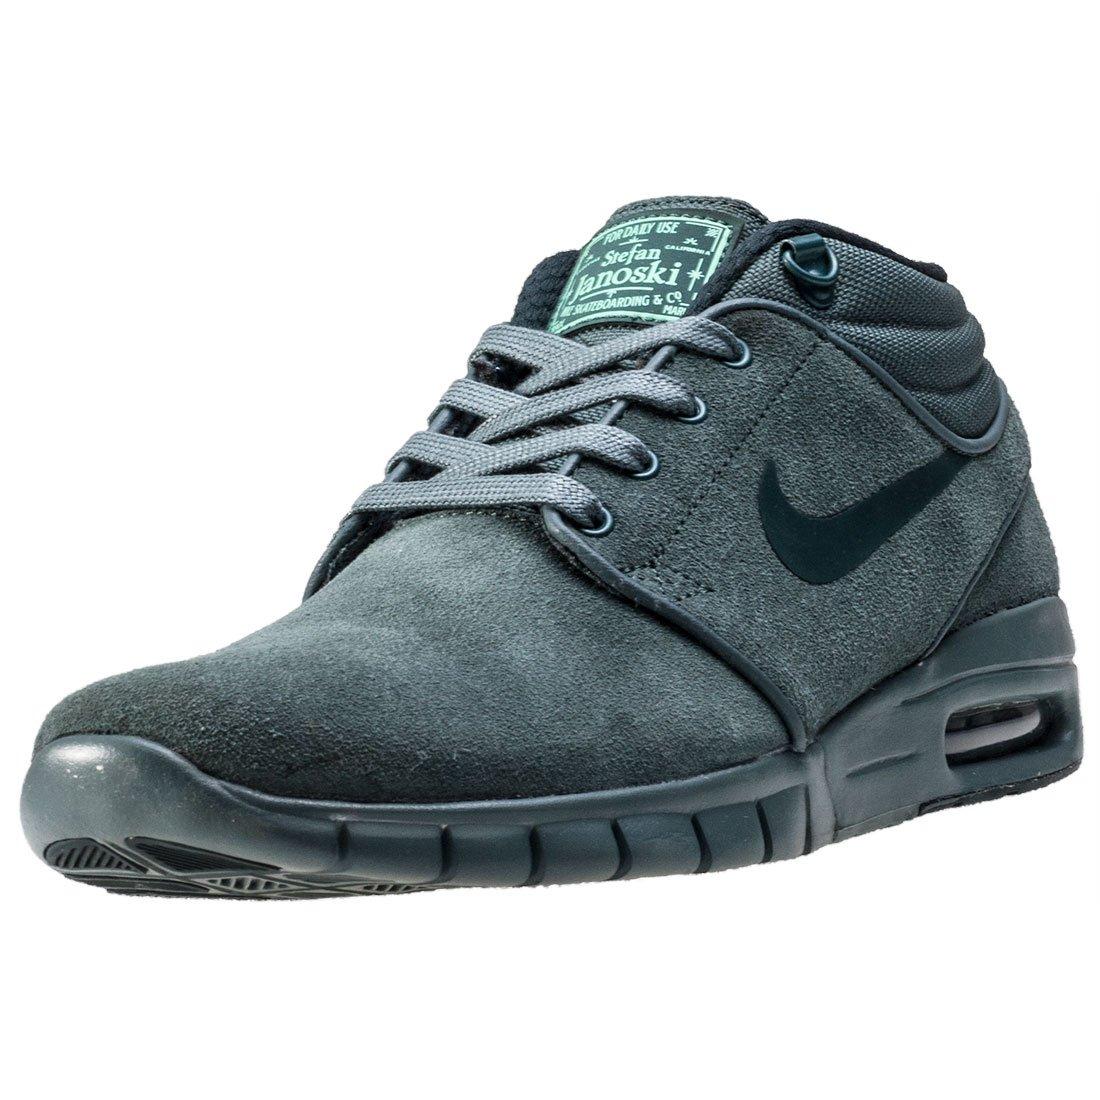 lowest price fb3f3 8ec40 Scarpe da Fitness Uomo 807509-333, Nike nsjysi6274-Altro